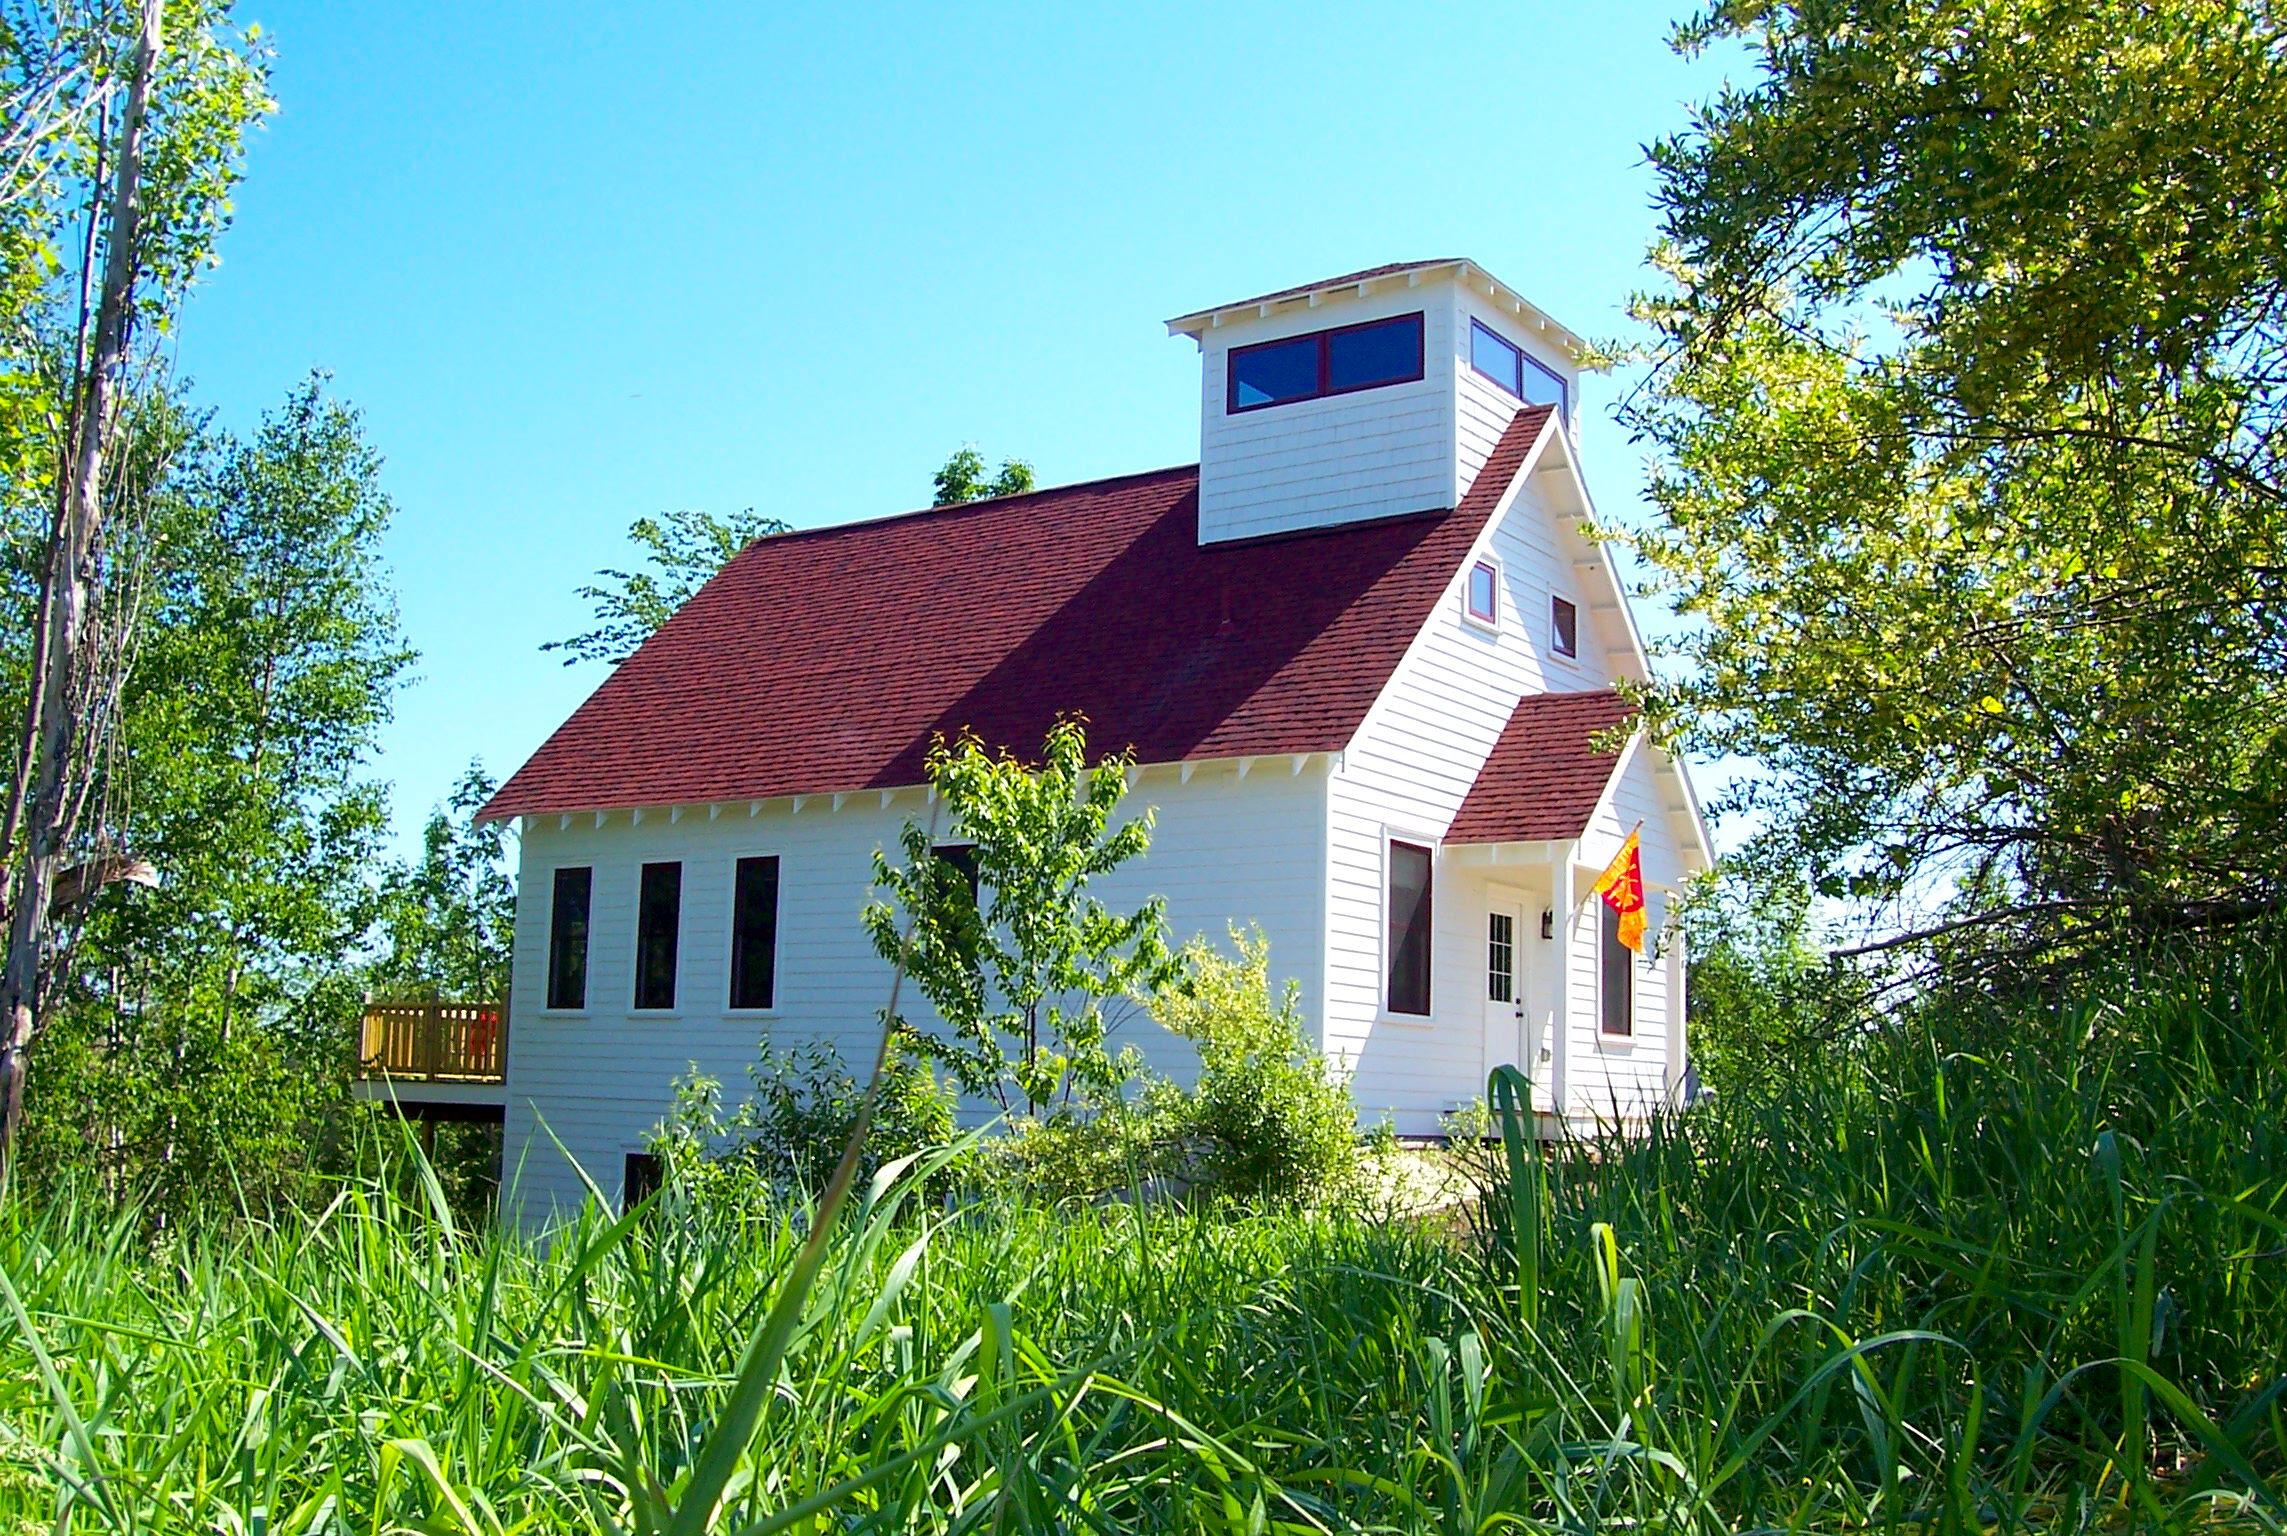 School House Cottage Vacation Rental, Arcadia MI